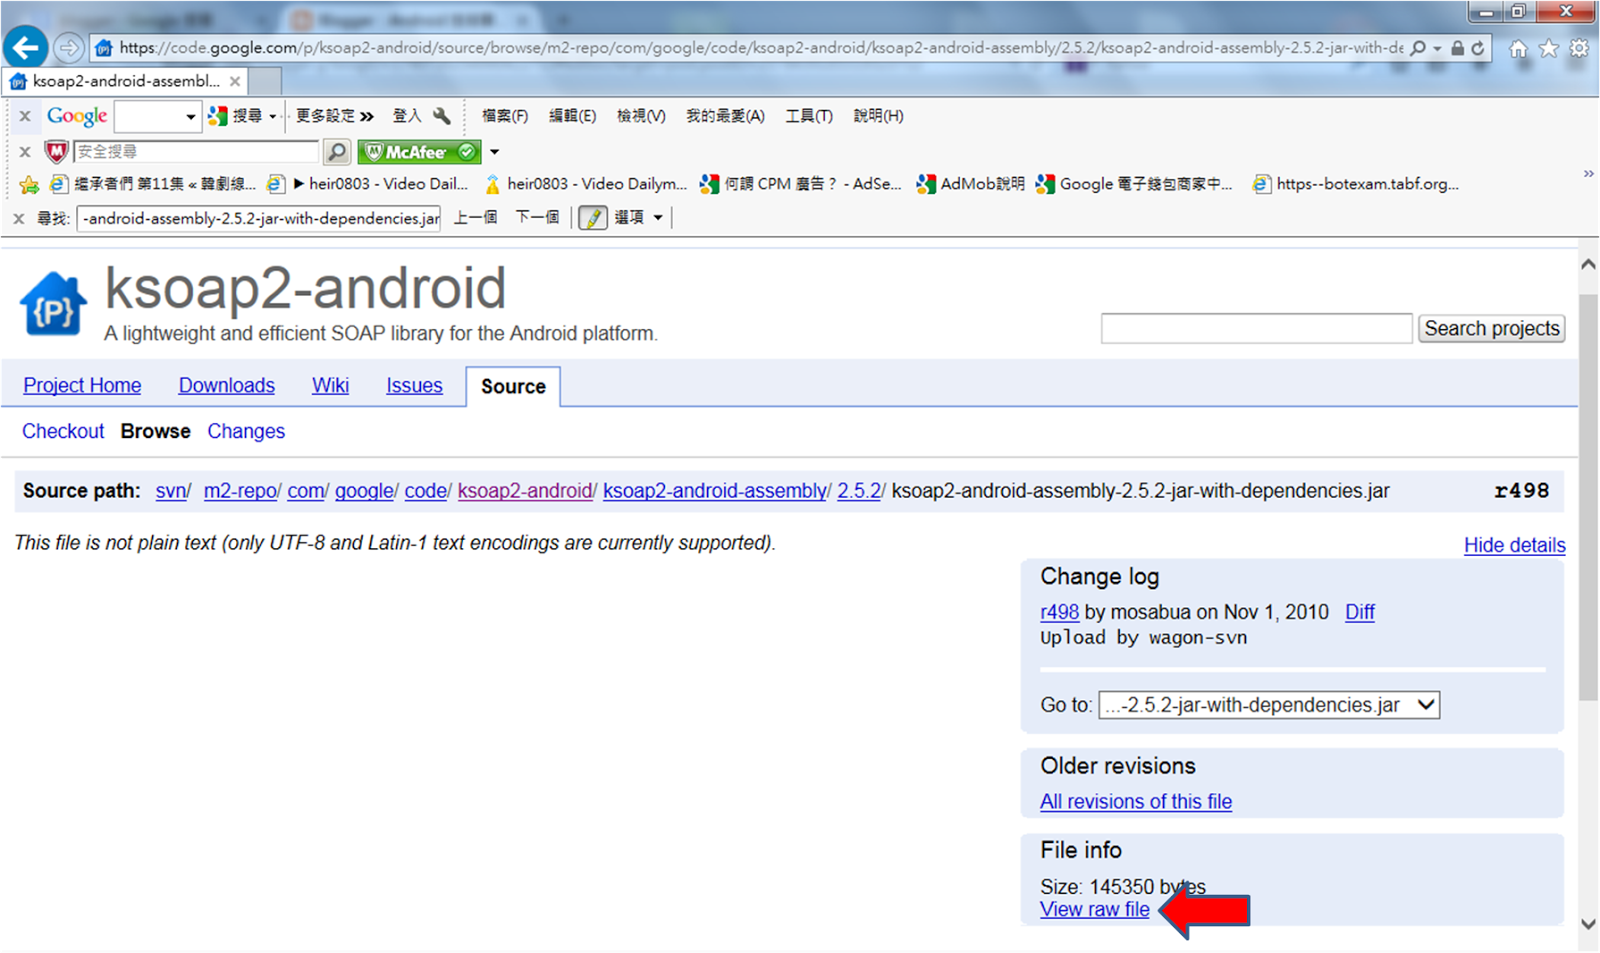 Android Code筆記本: 使用第三方之Web Service(攝氏與華氏相互轉換)